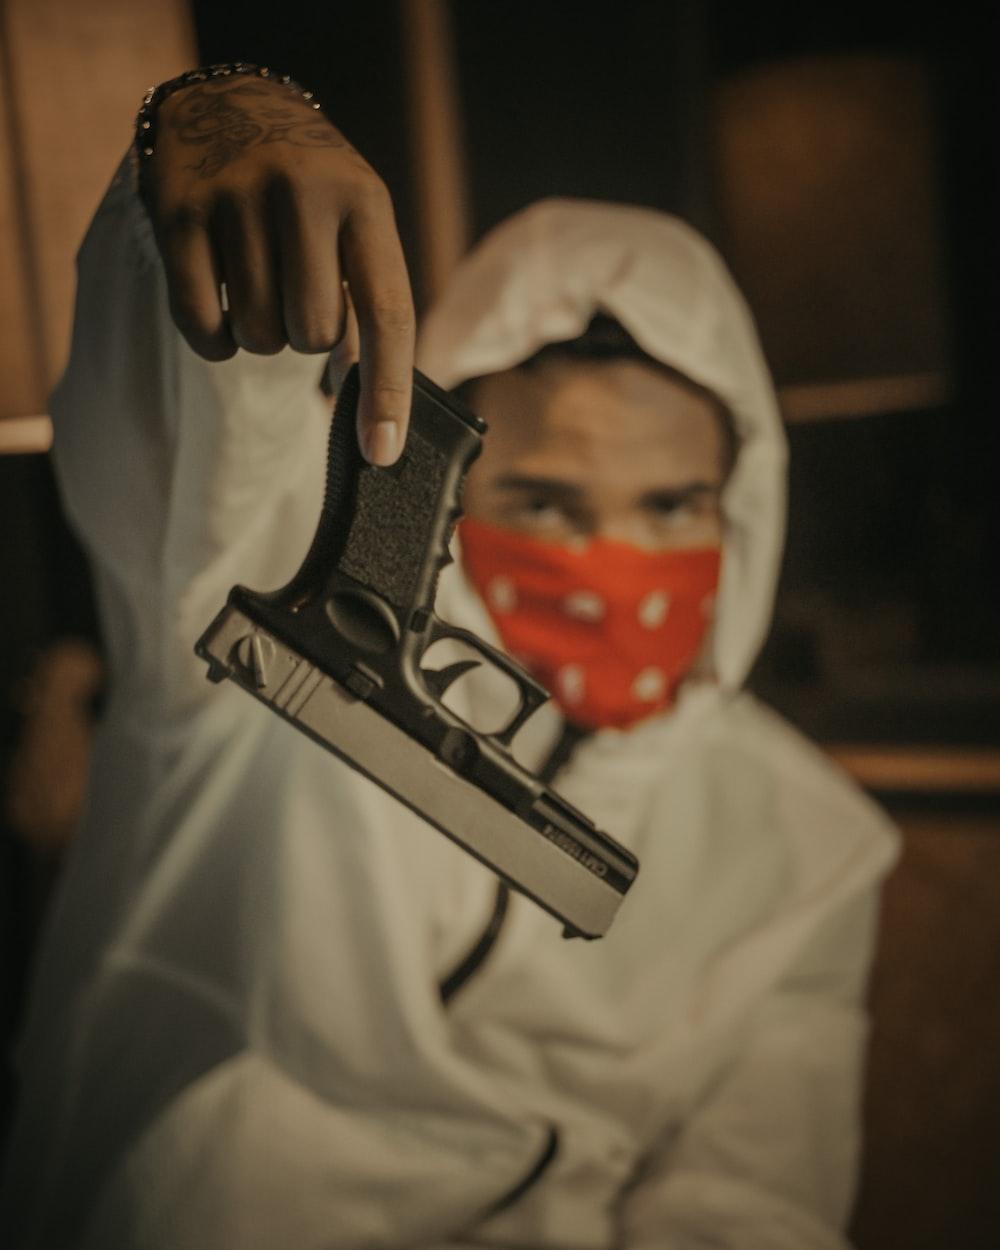 person holding black and silver semi automatic pistol